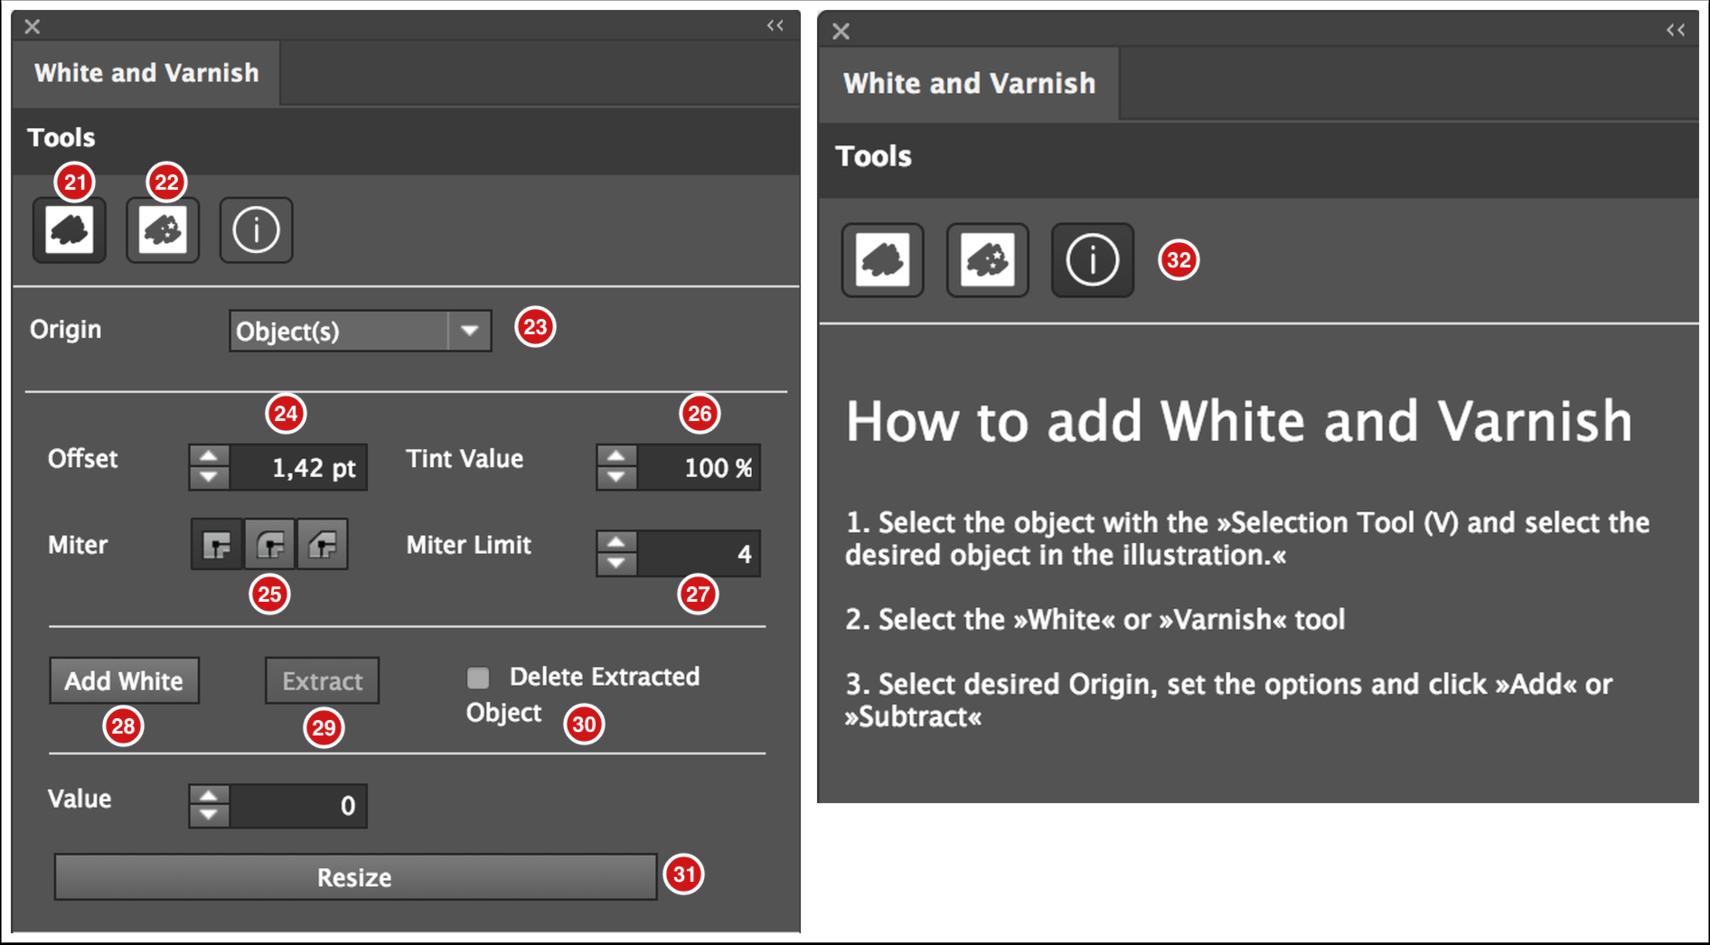 Adobe Illustrator Plug-in - White and Varnish